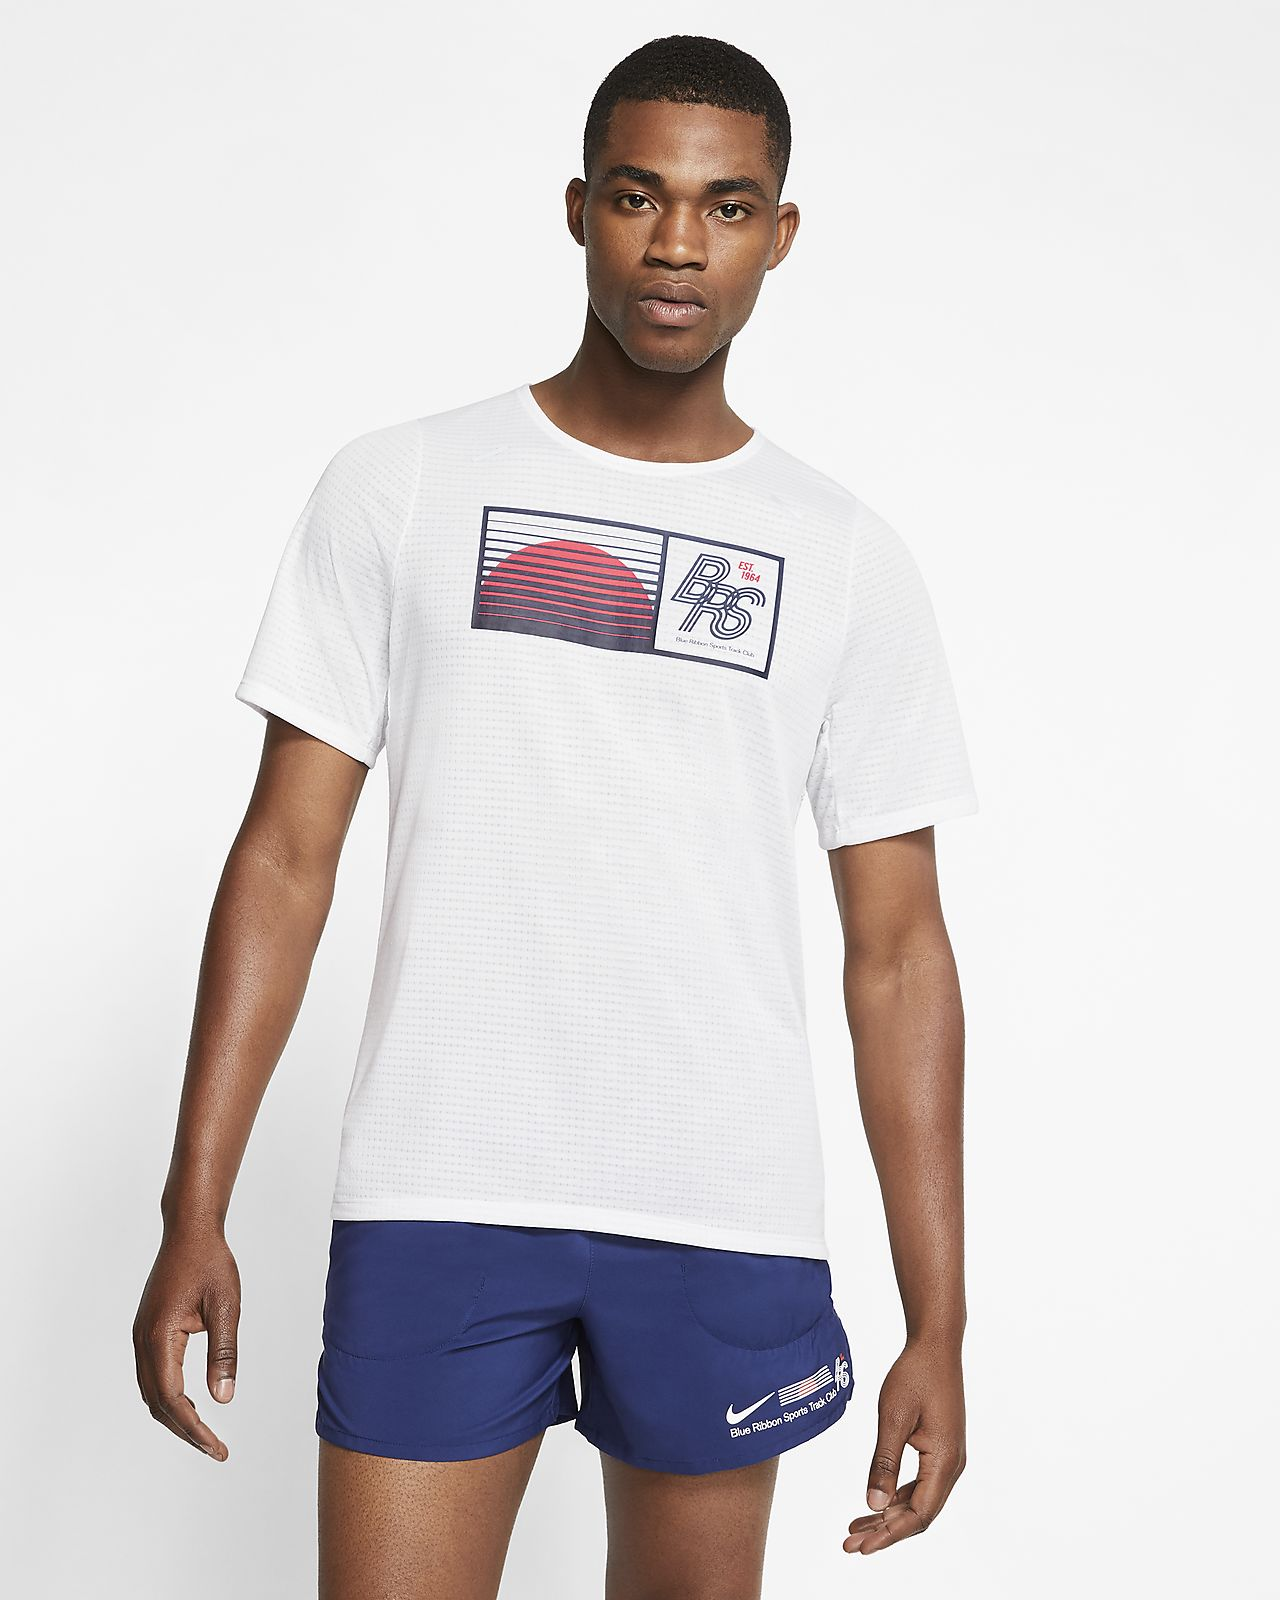 Nike Rise 365 Blue Ribbon Sports Herren-Laufoberteil